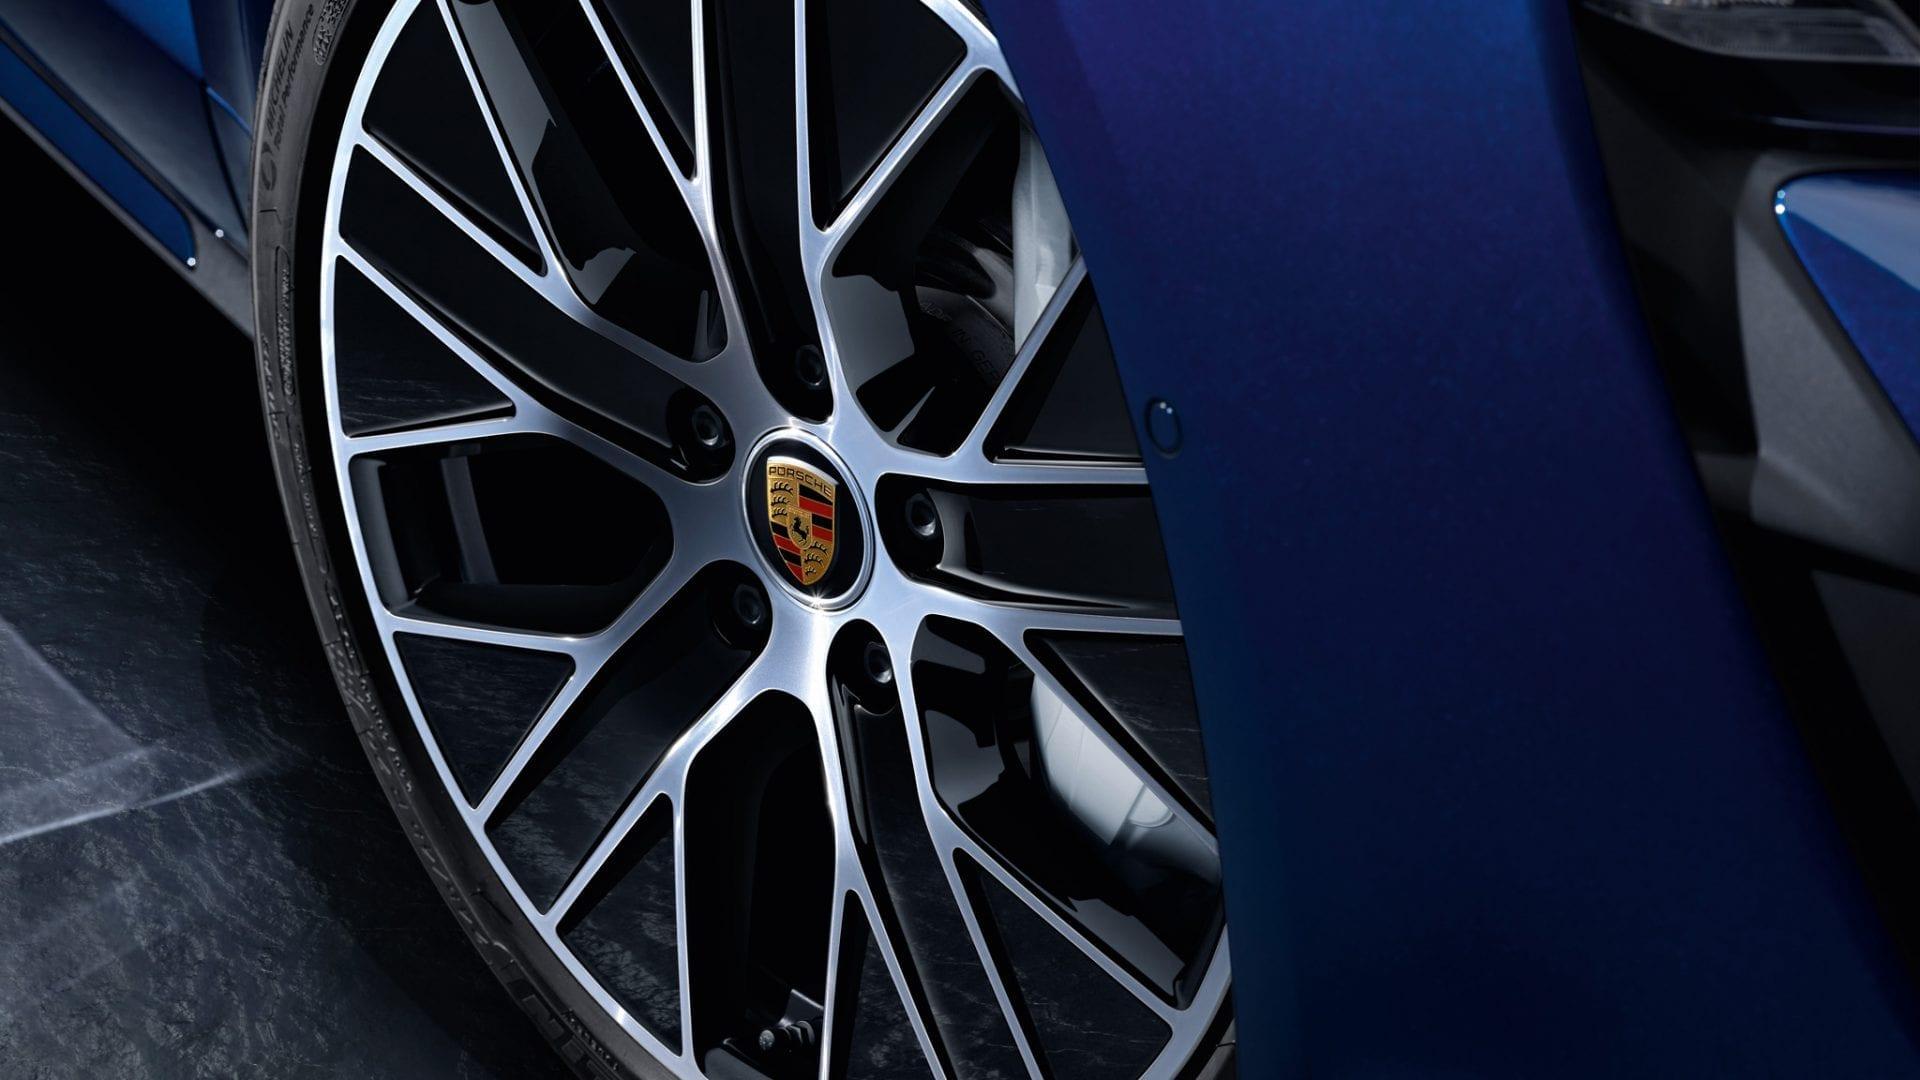 Taycanin rengas Porschen logolla vanteessa.